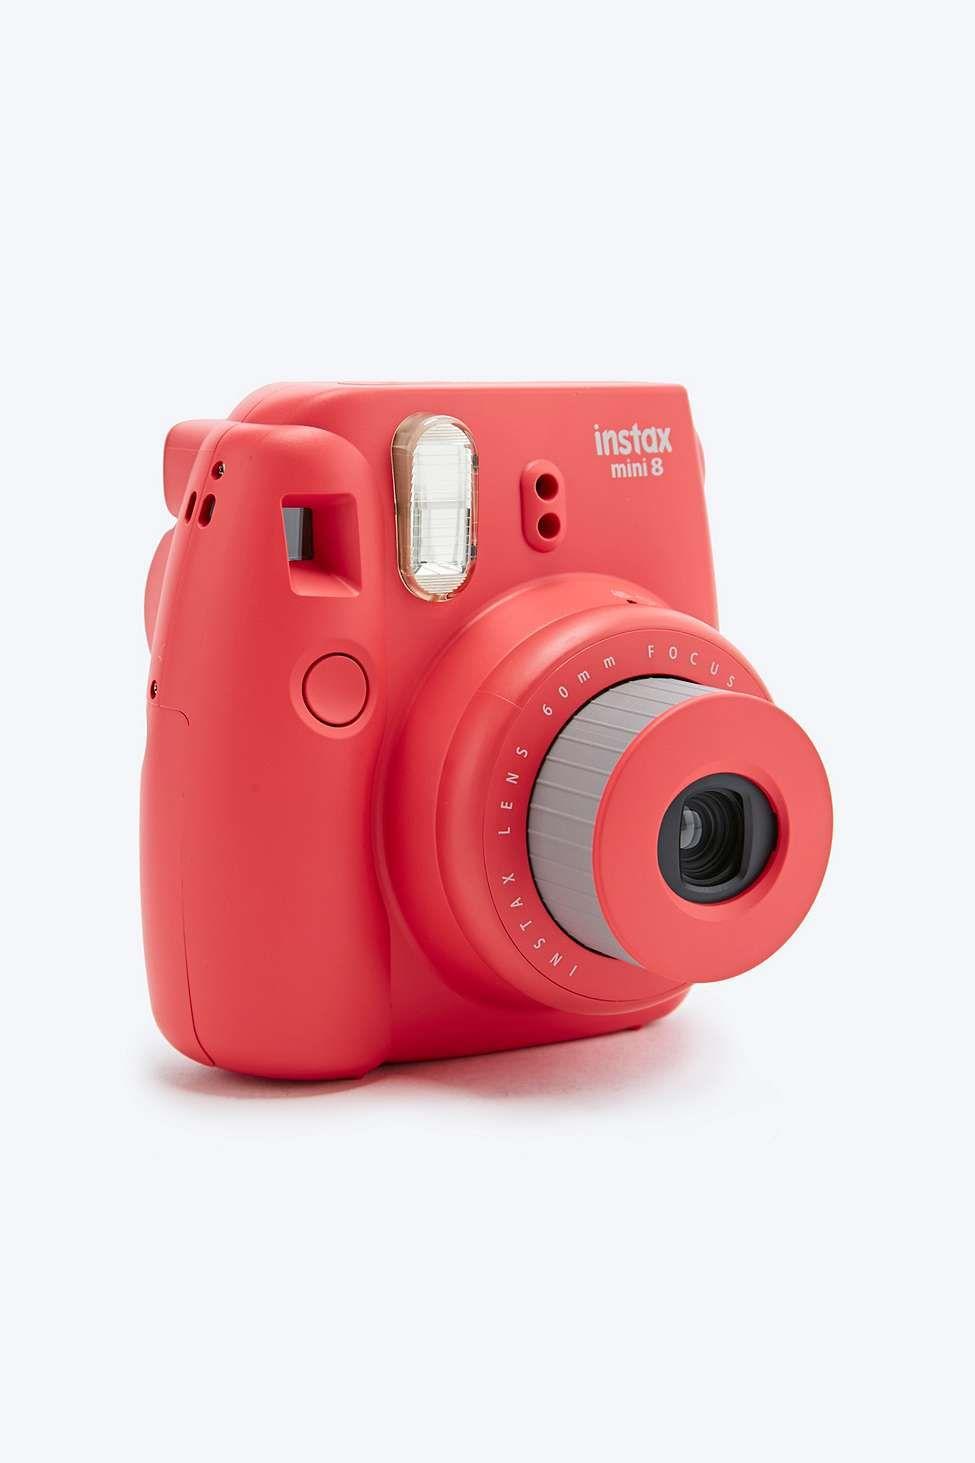 Fujifilm Appareil Photo Instax Mini 8 Rose Fonce I M A G I E N